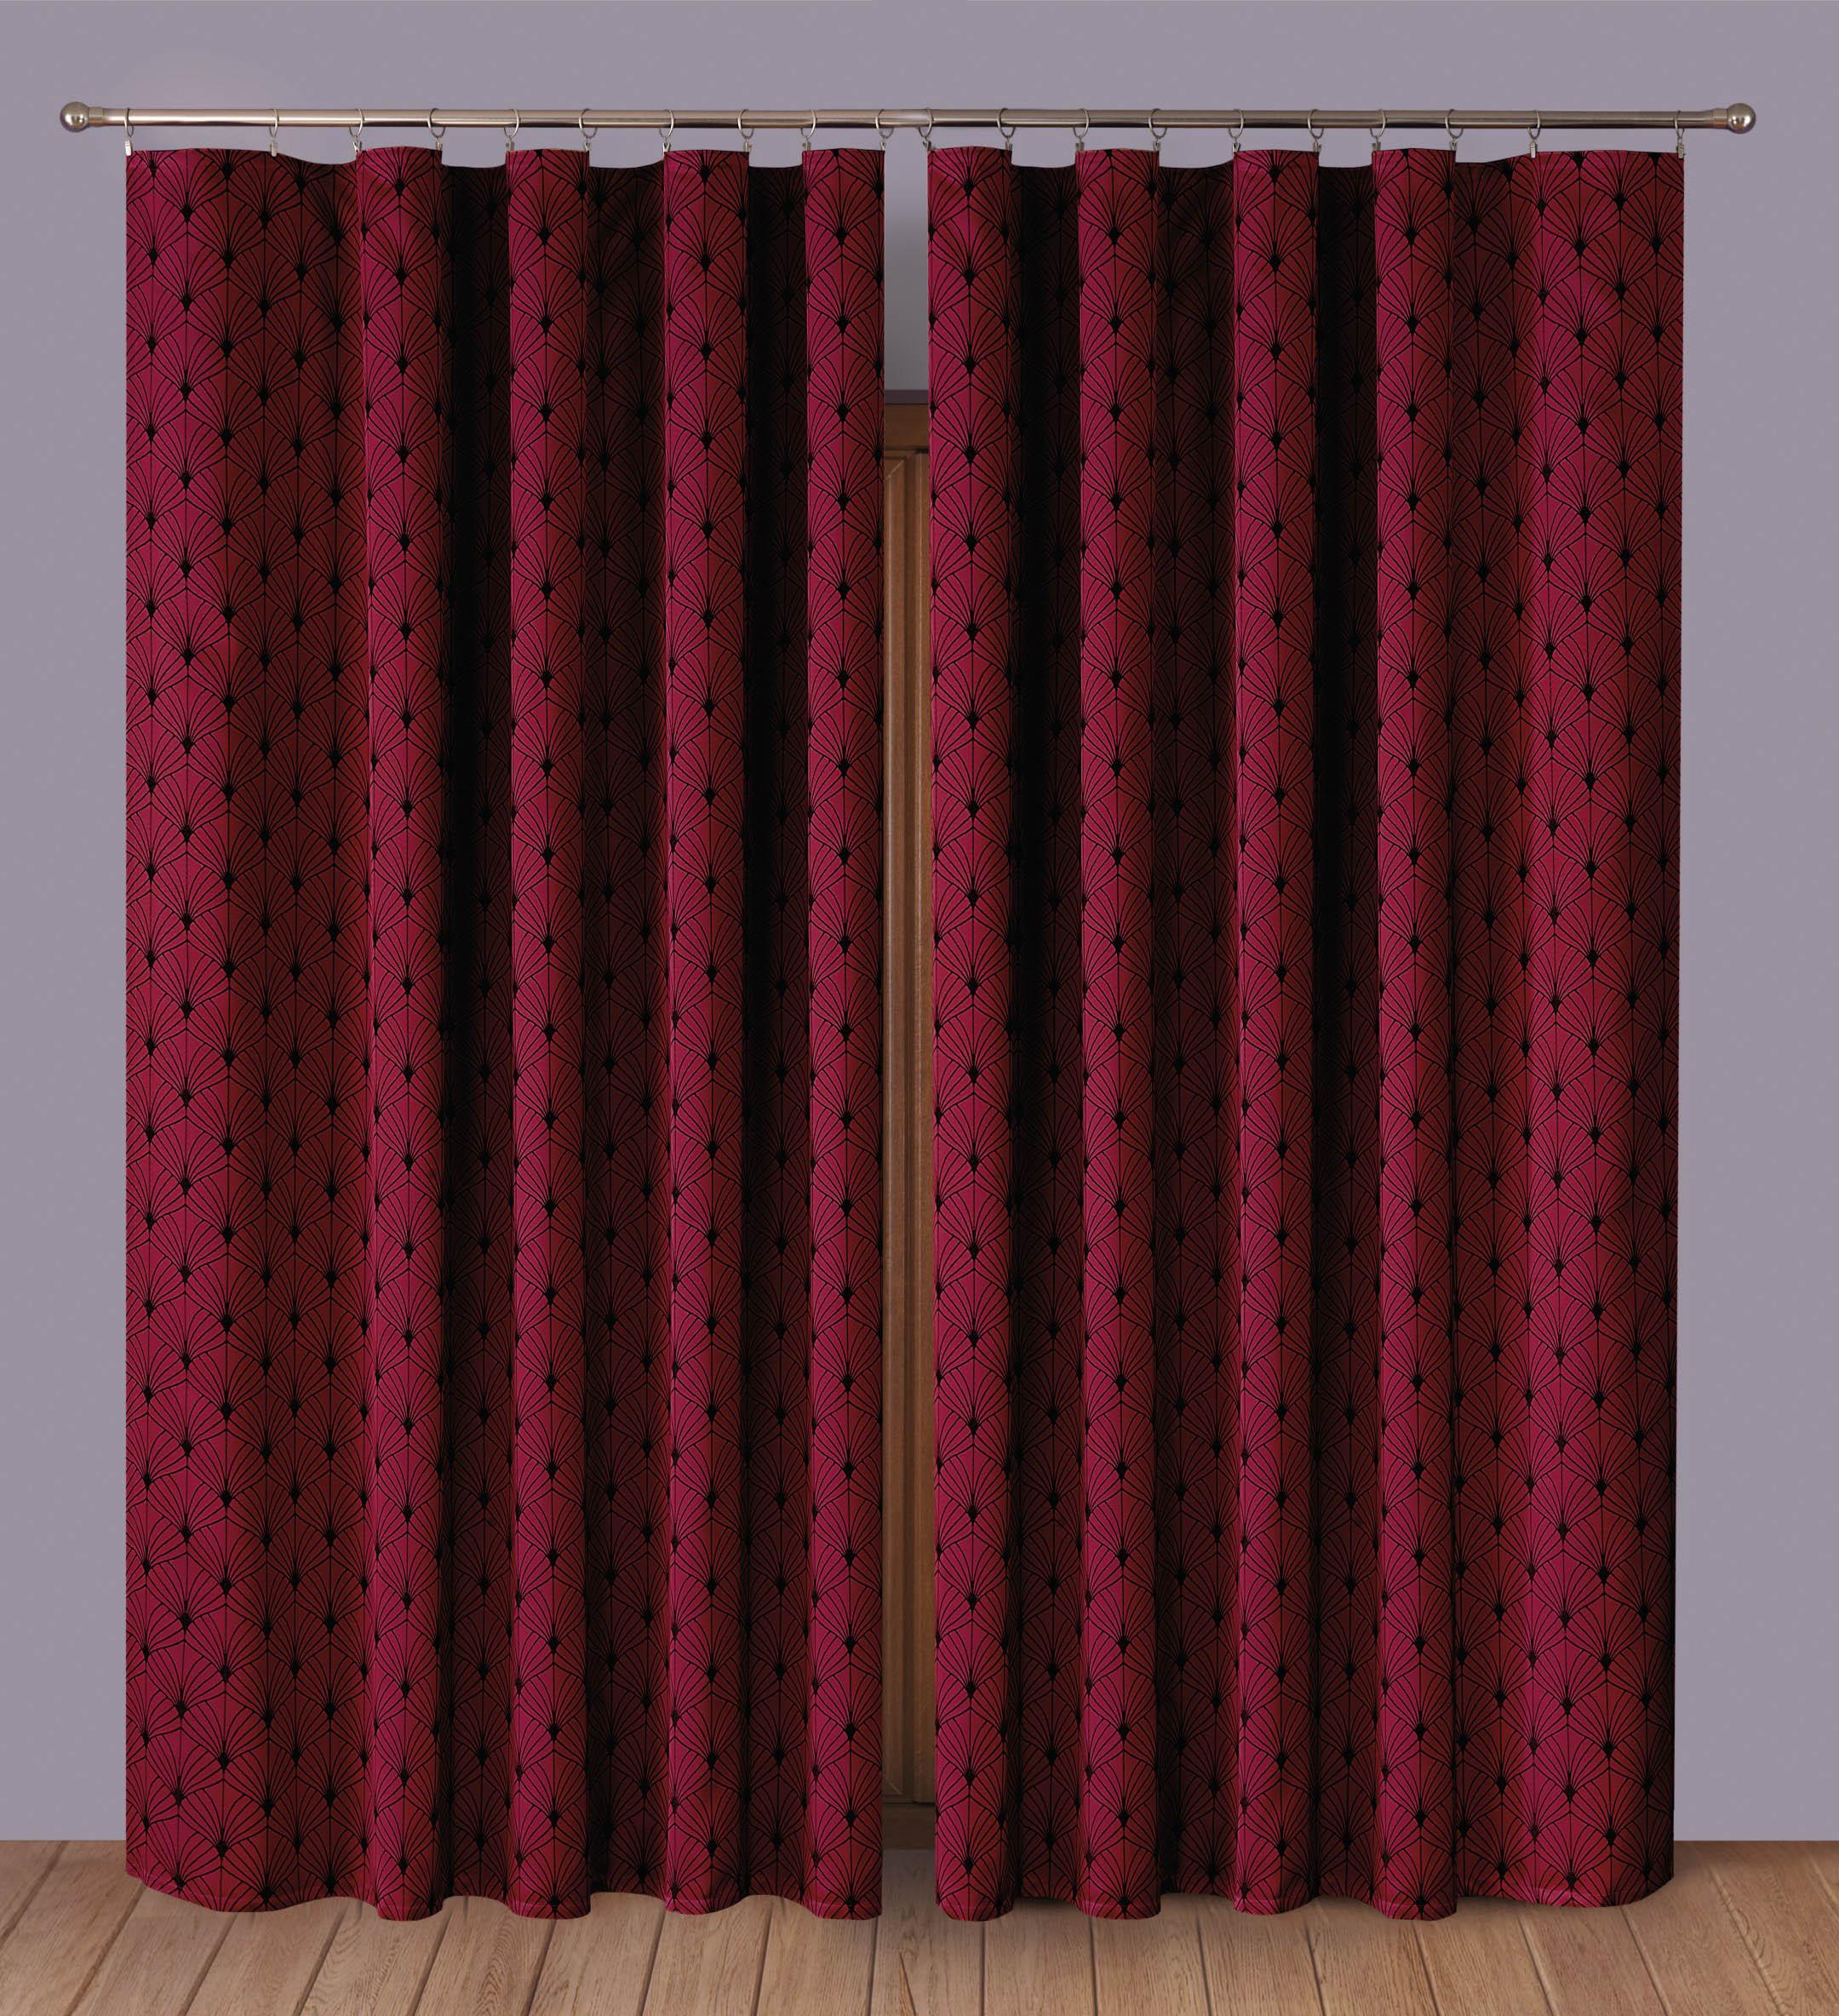 Шторы Primavera Классические шторы Albertine Цвет: Бордовый шторы primavera классические шторы tilly цвет серый